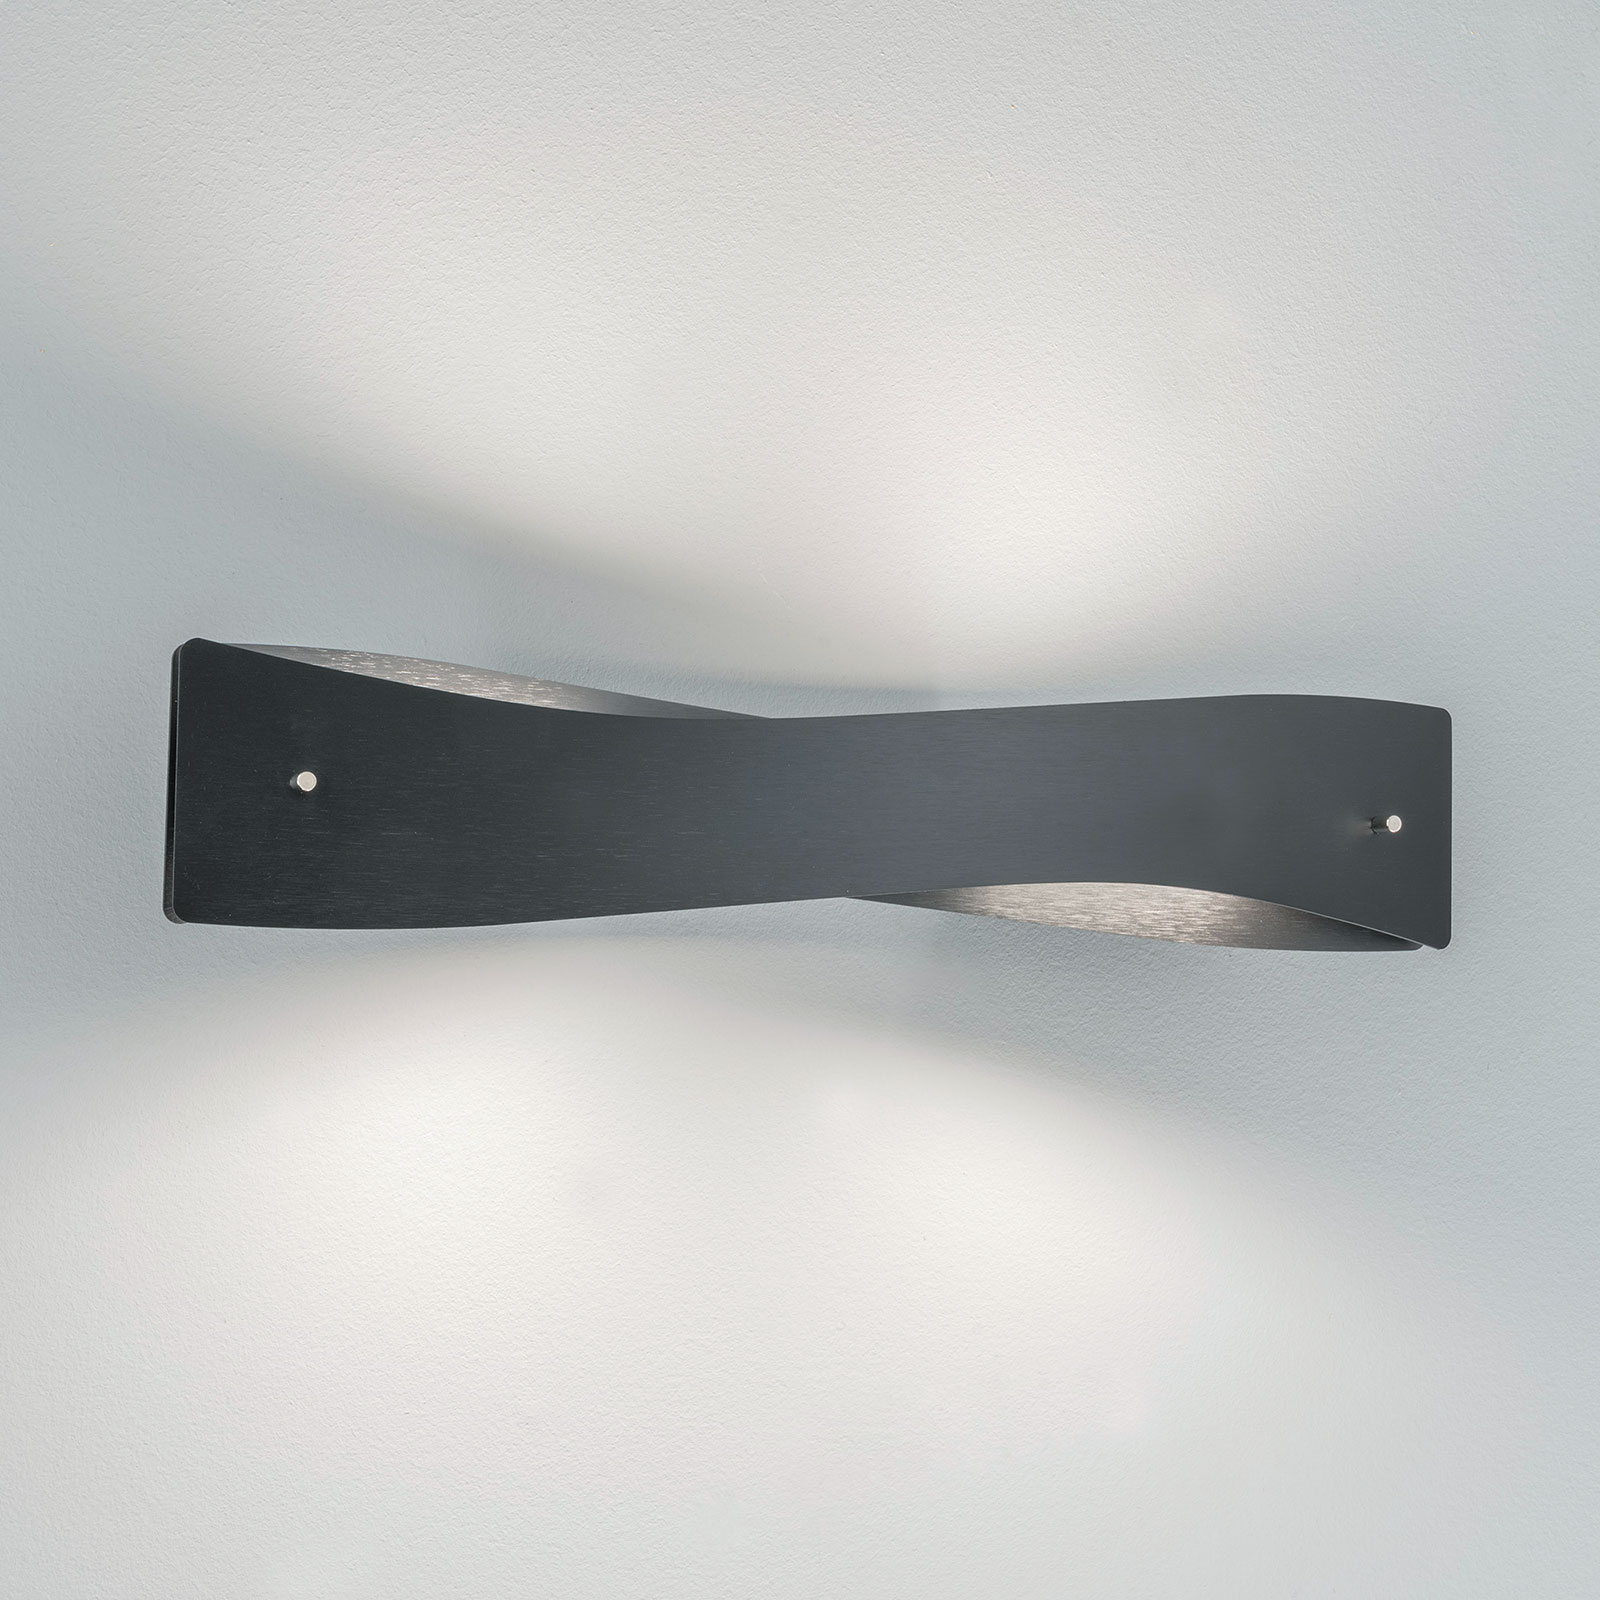 Lucande Lian kinkiet LED, czarny, aluminium